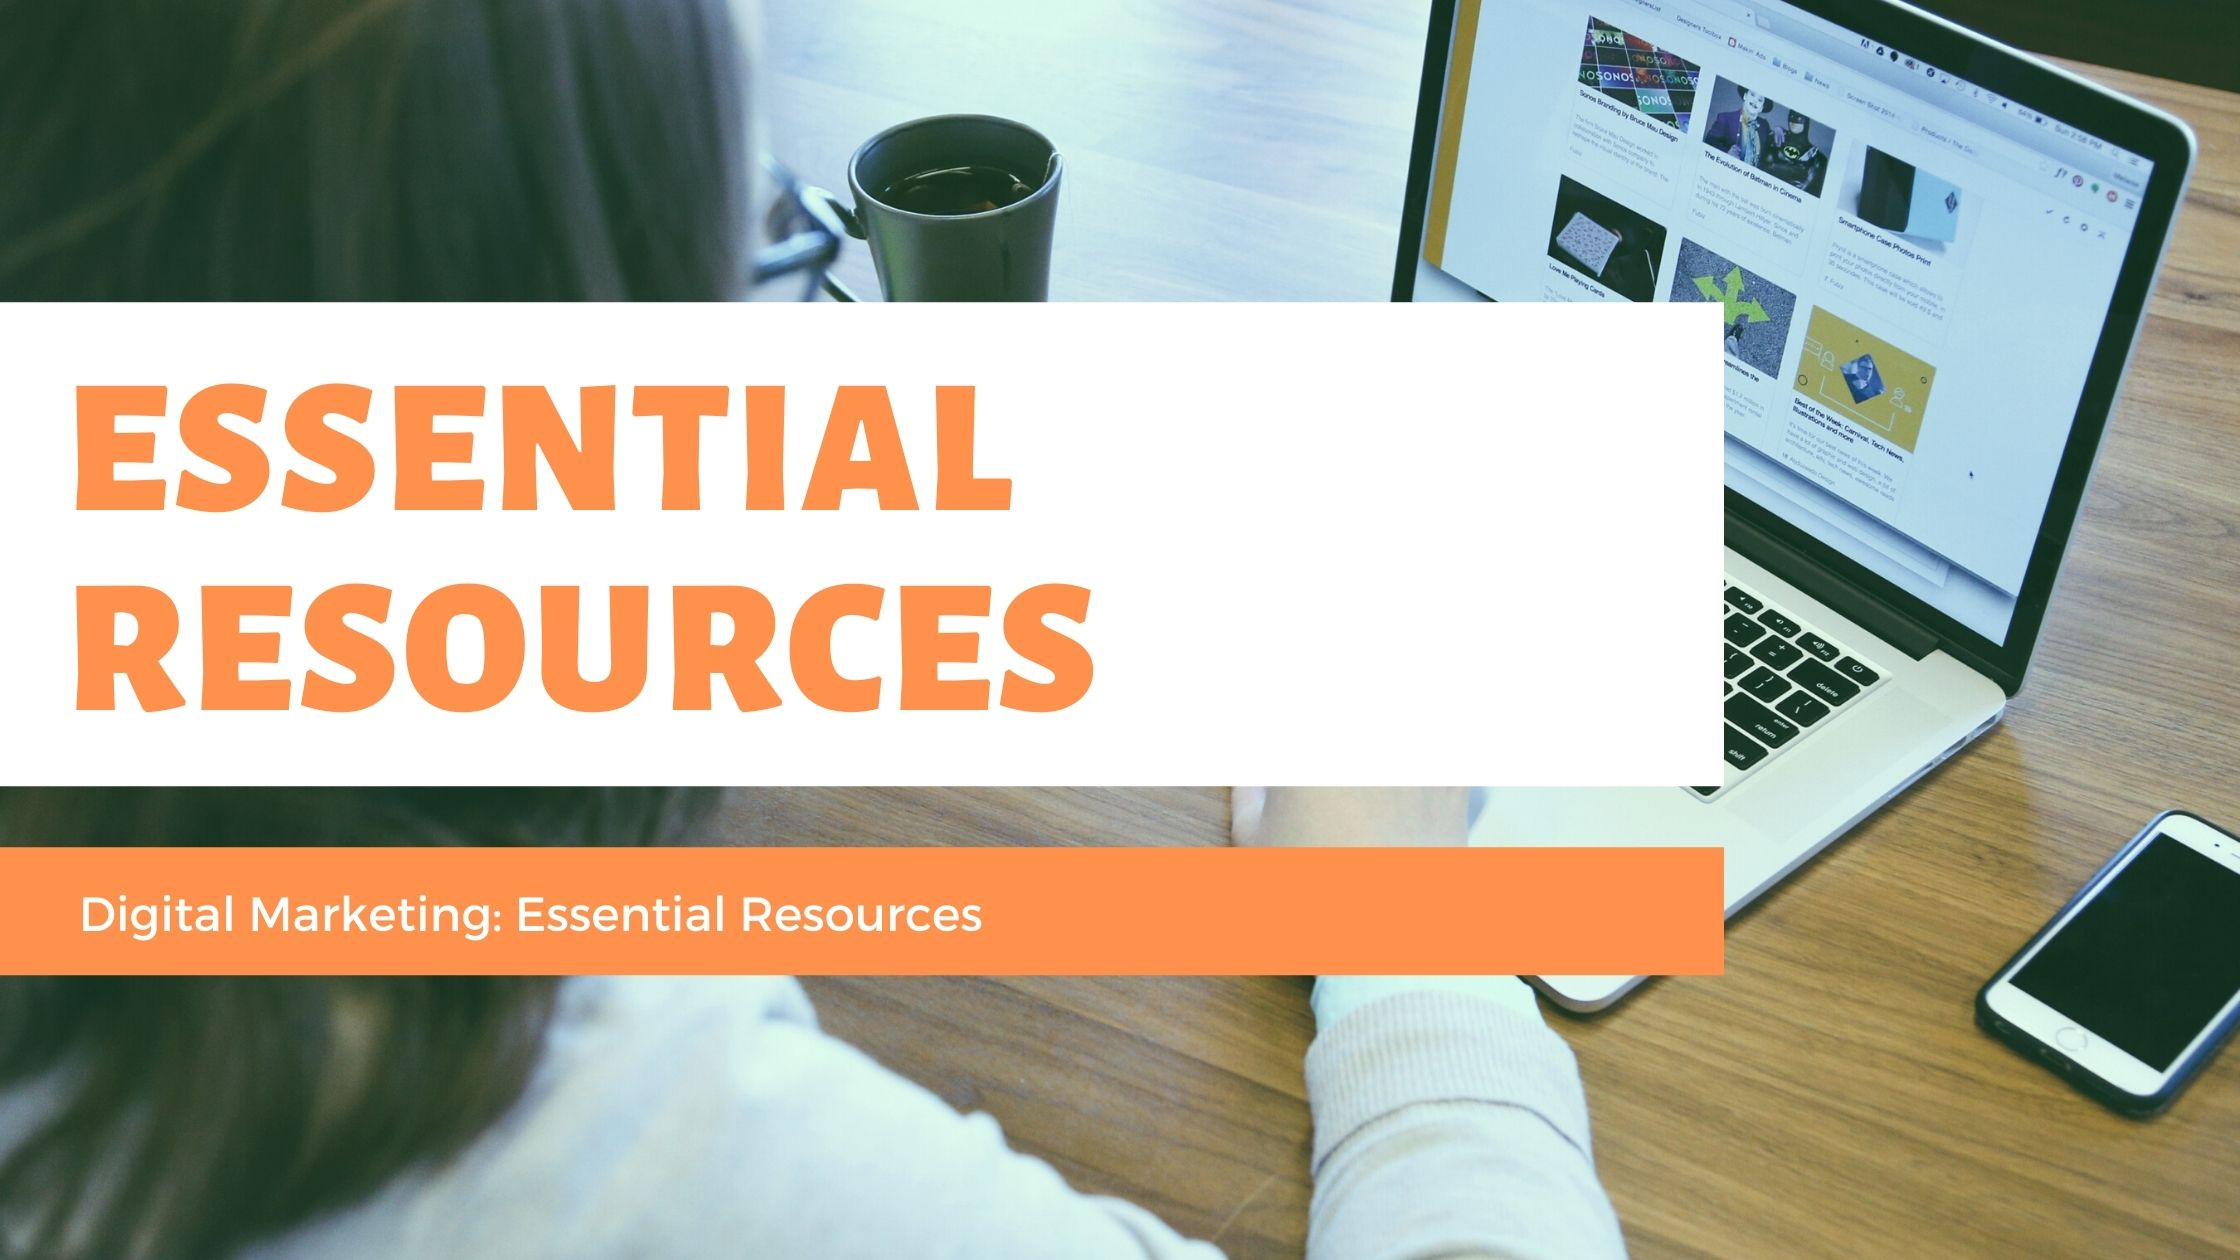 Digital Marketing: Essential Resources